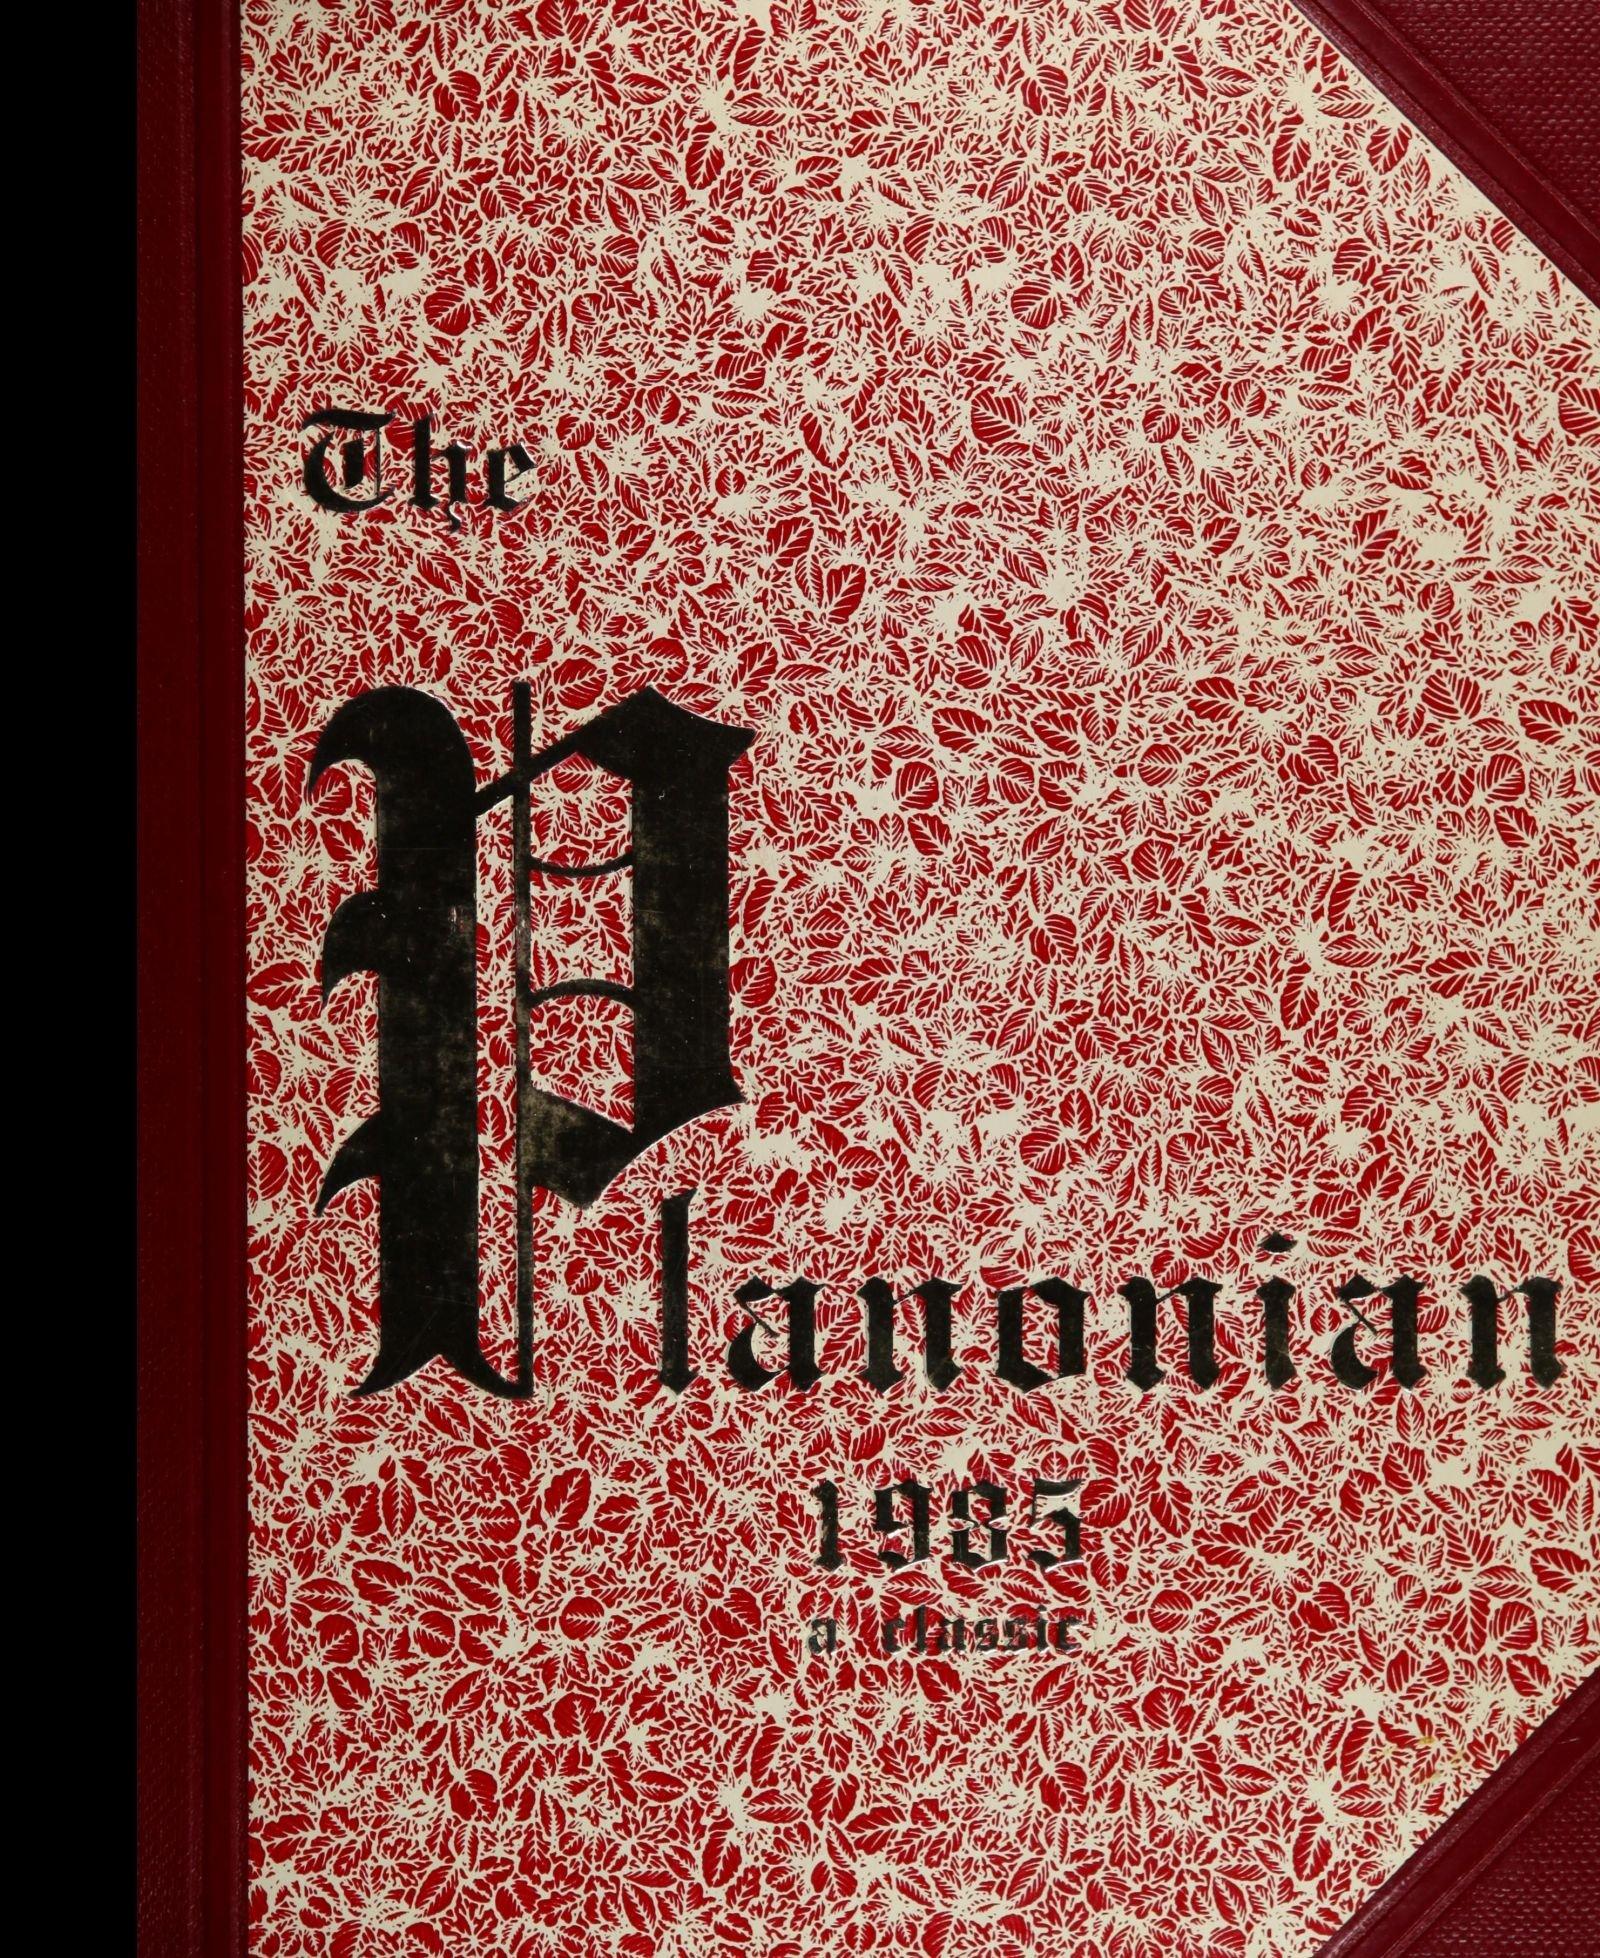 Reprint) 1985 Yearbook: Plano Senior High School, Plano